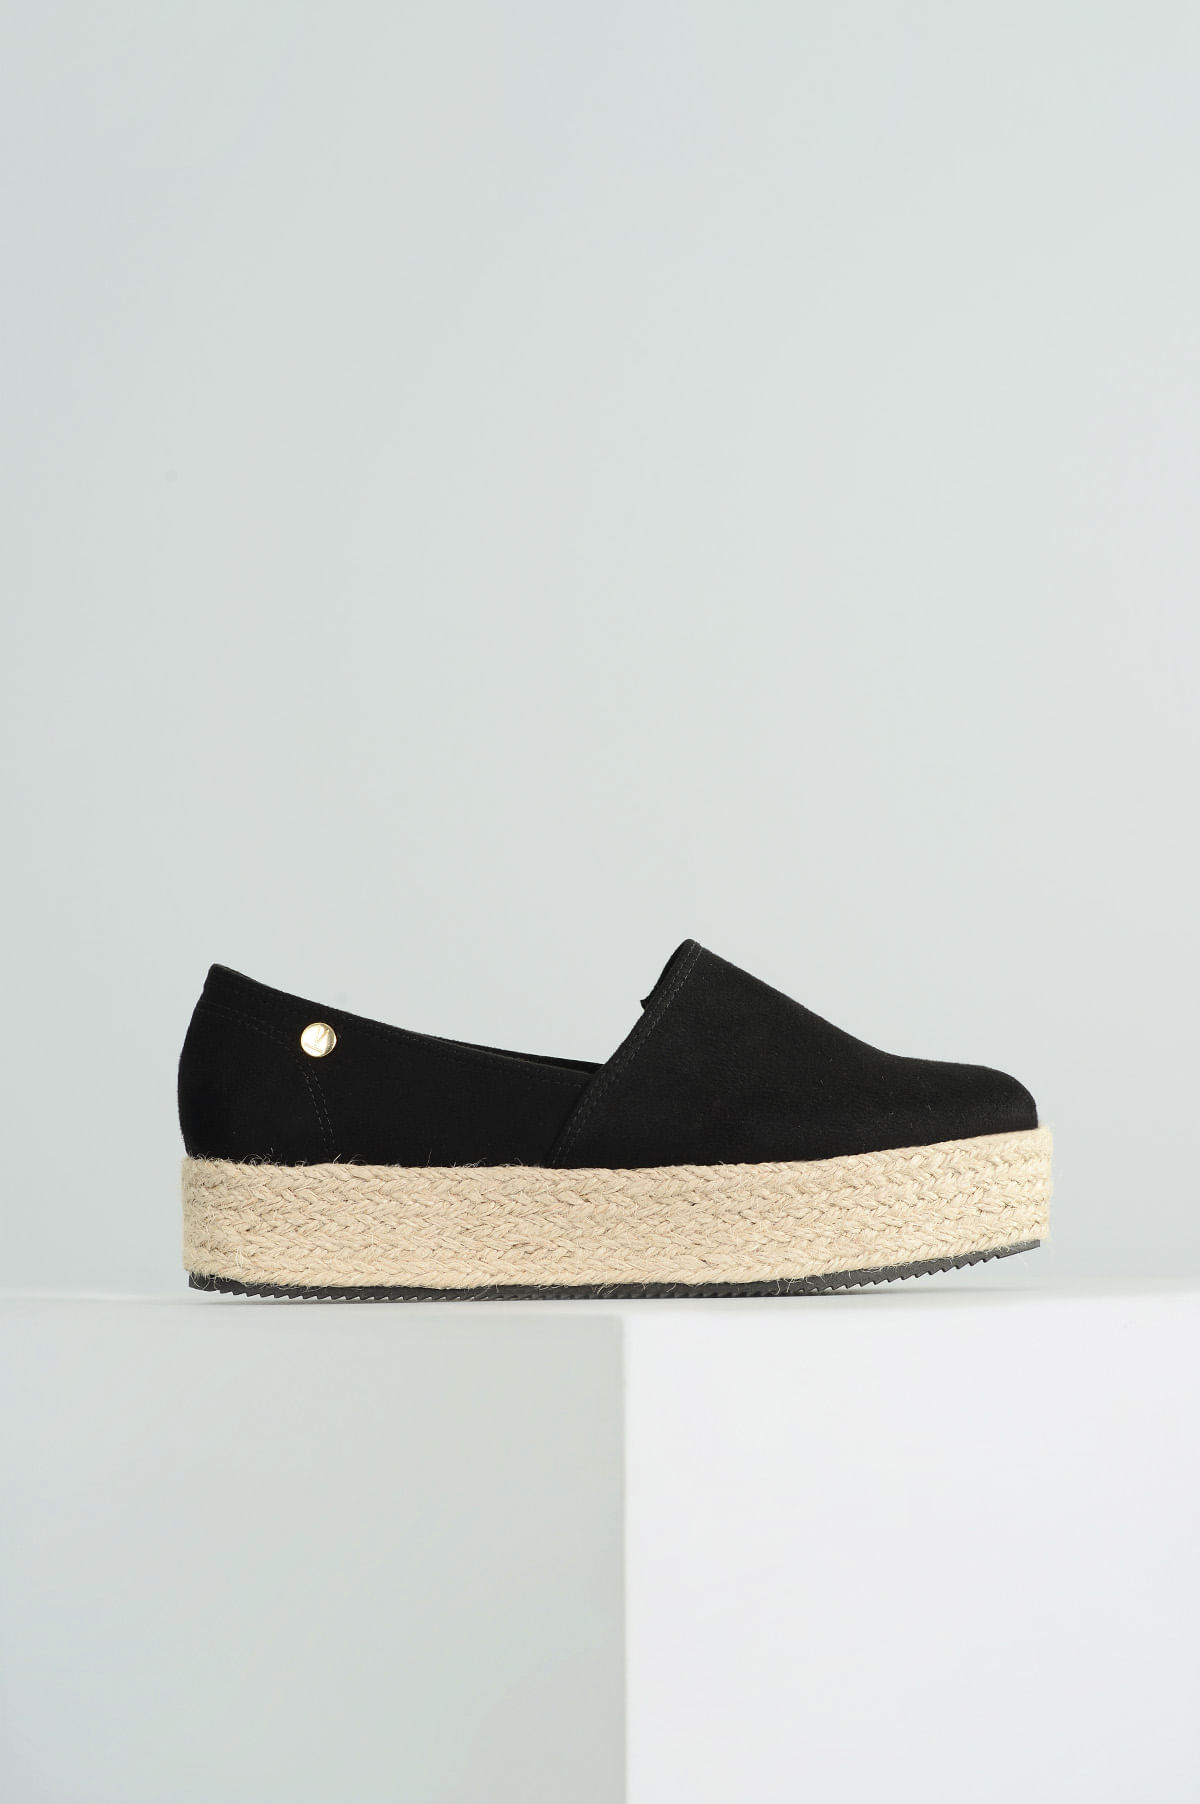 c0174656ad Sapato Feminino Espadrille Rudye Vizzano CAM - PRETO - Mundial Calçados